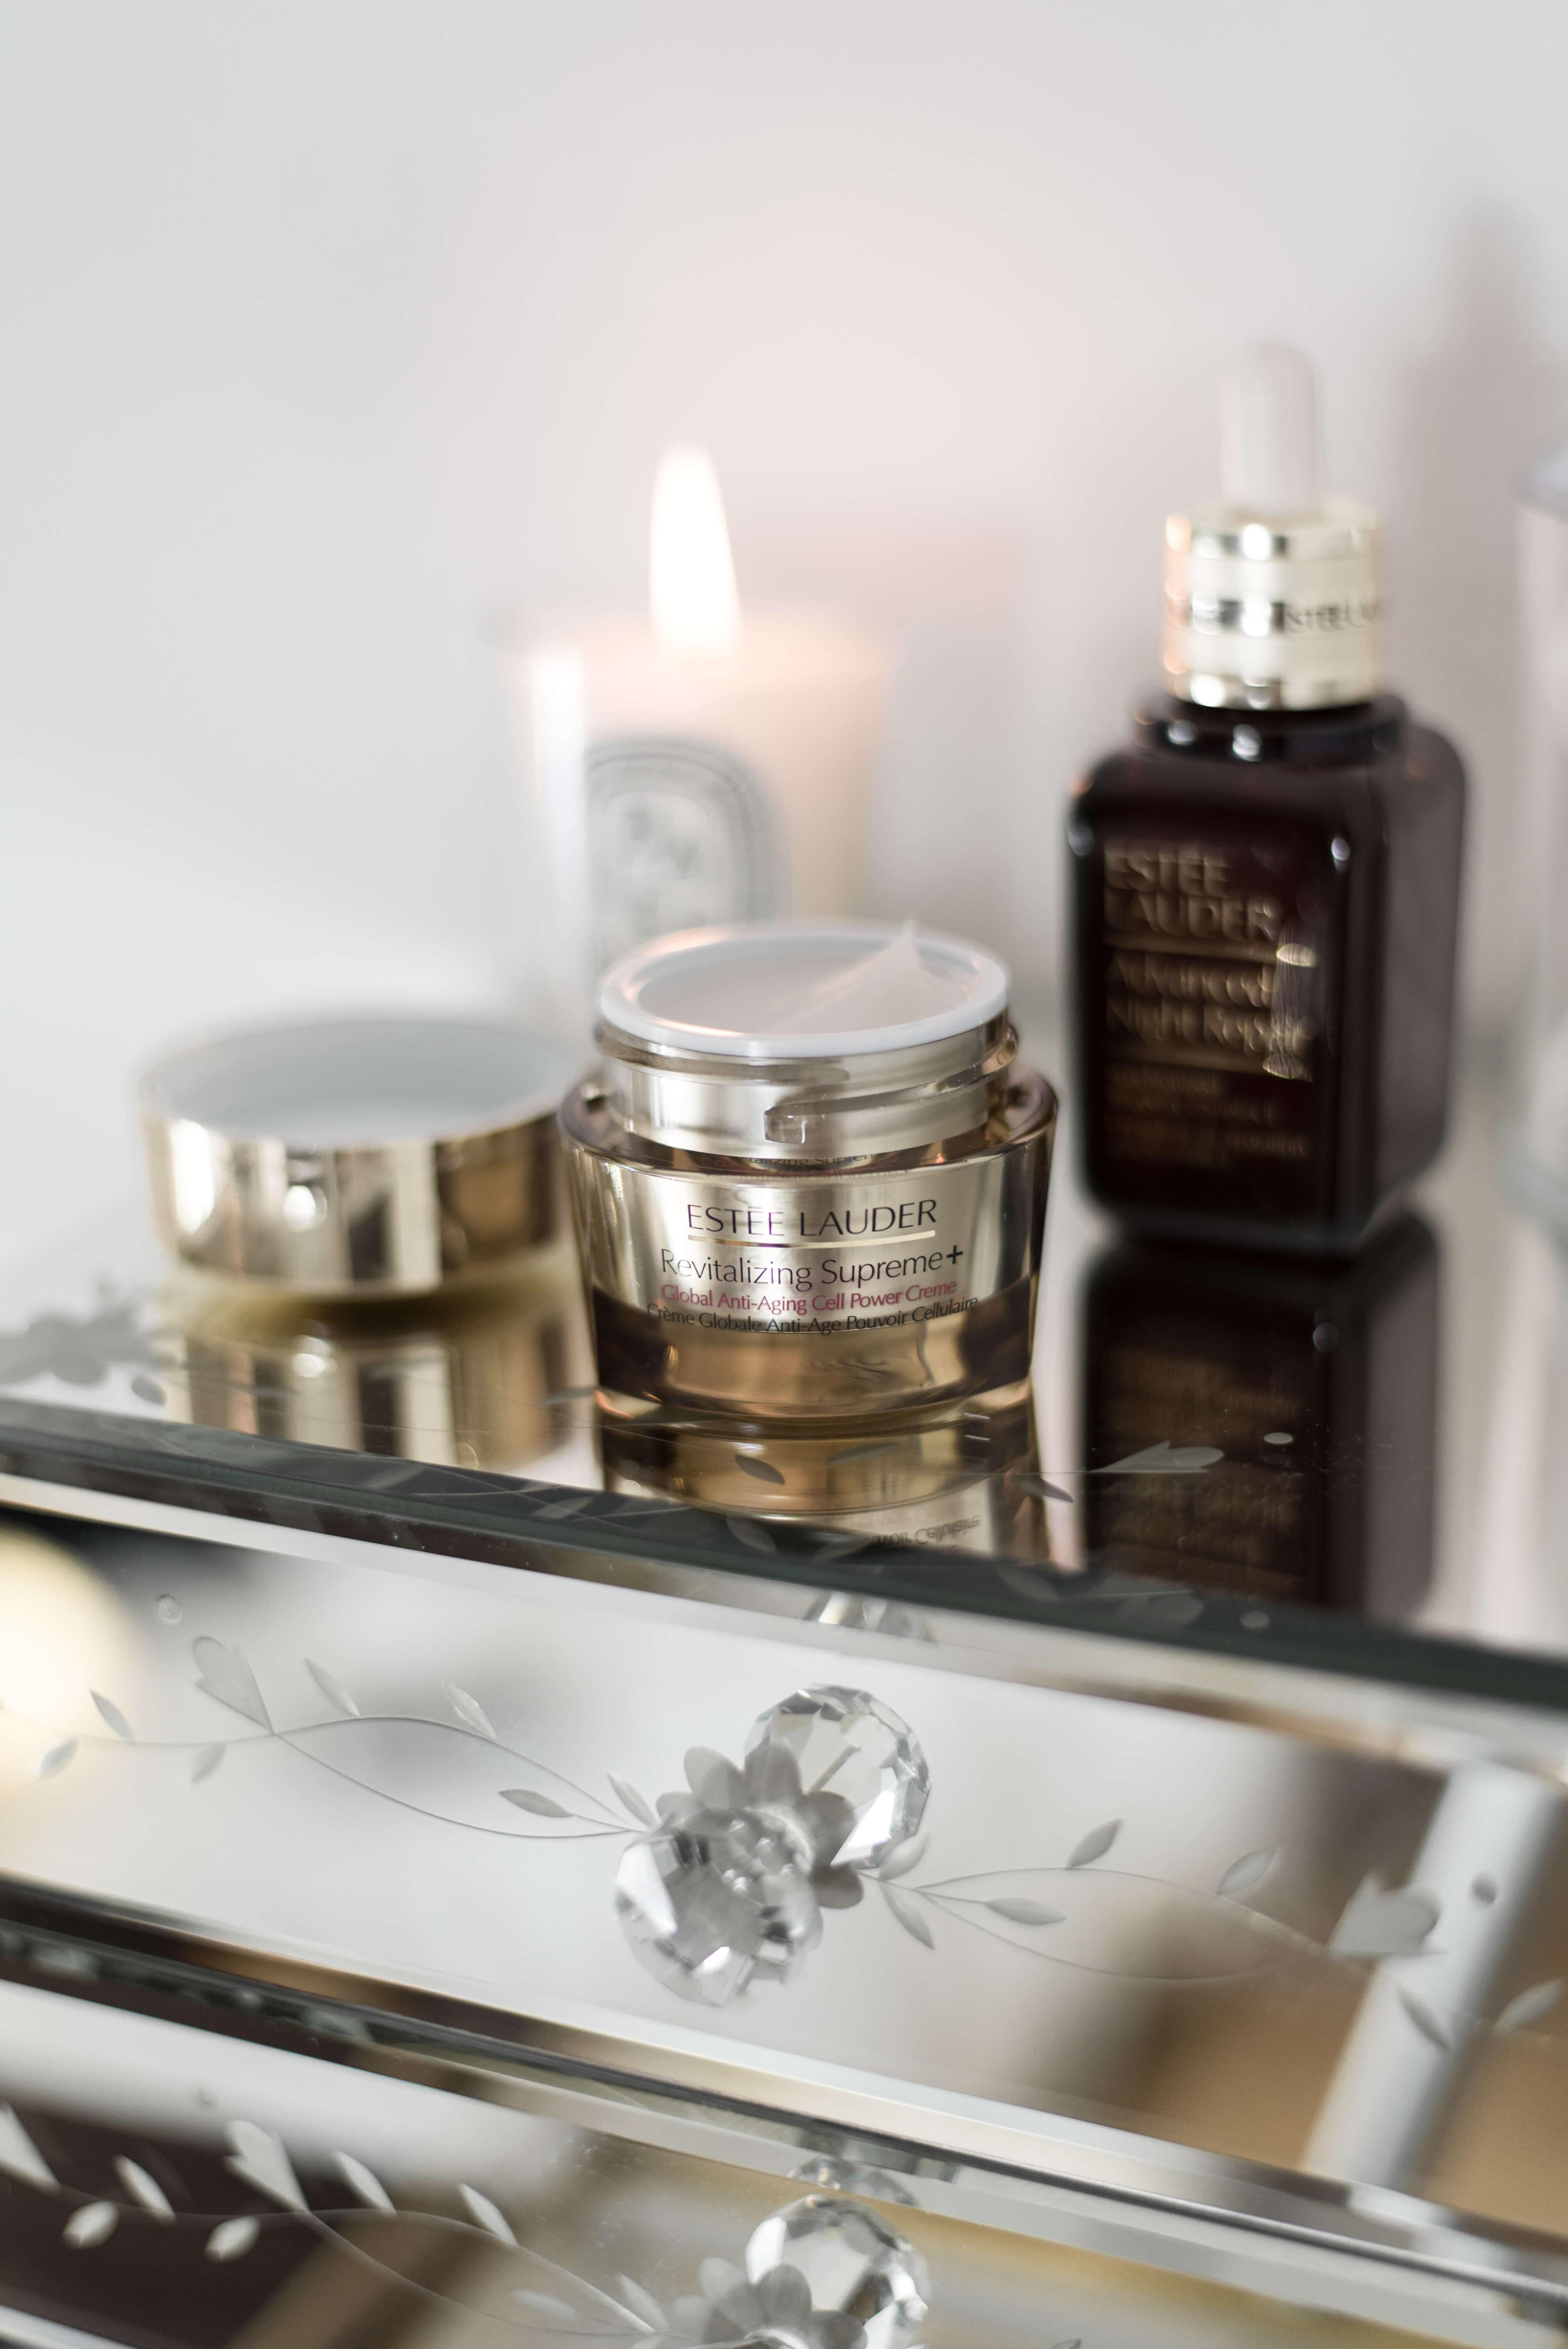 Adventkalender Tag 13: Estée Lauder Skincare | Dolce Petite